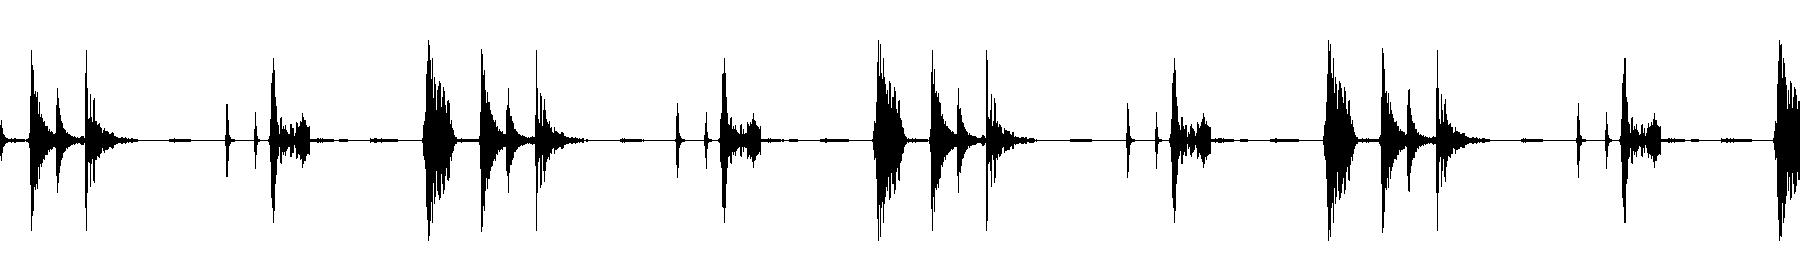 mf rdtf 09 percussion loops 125bpm